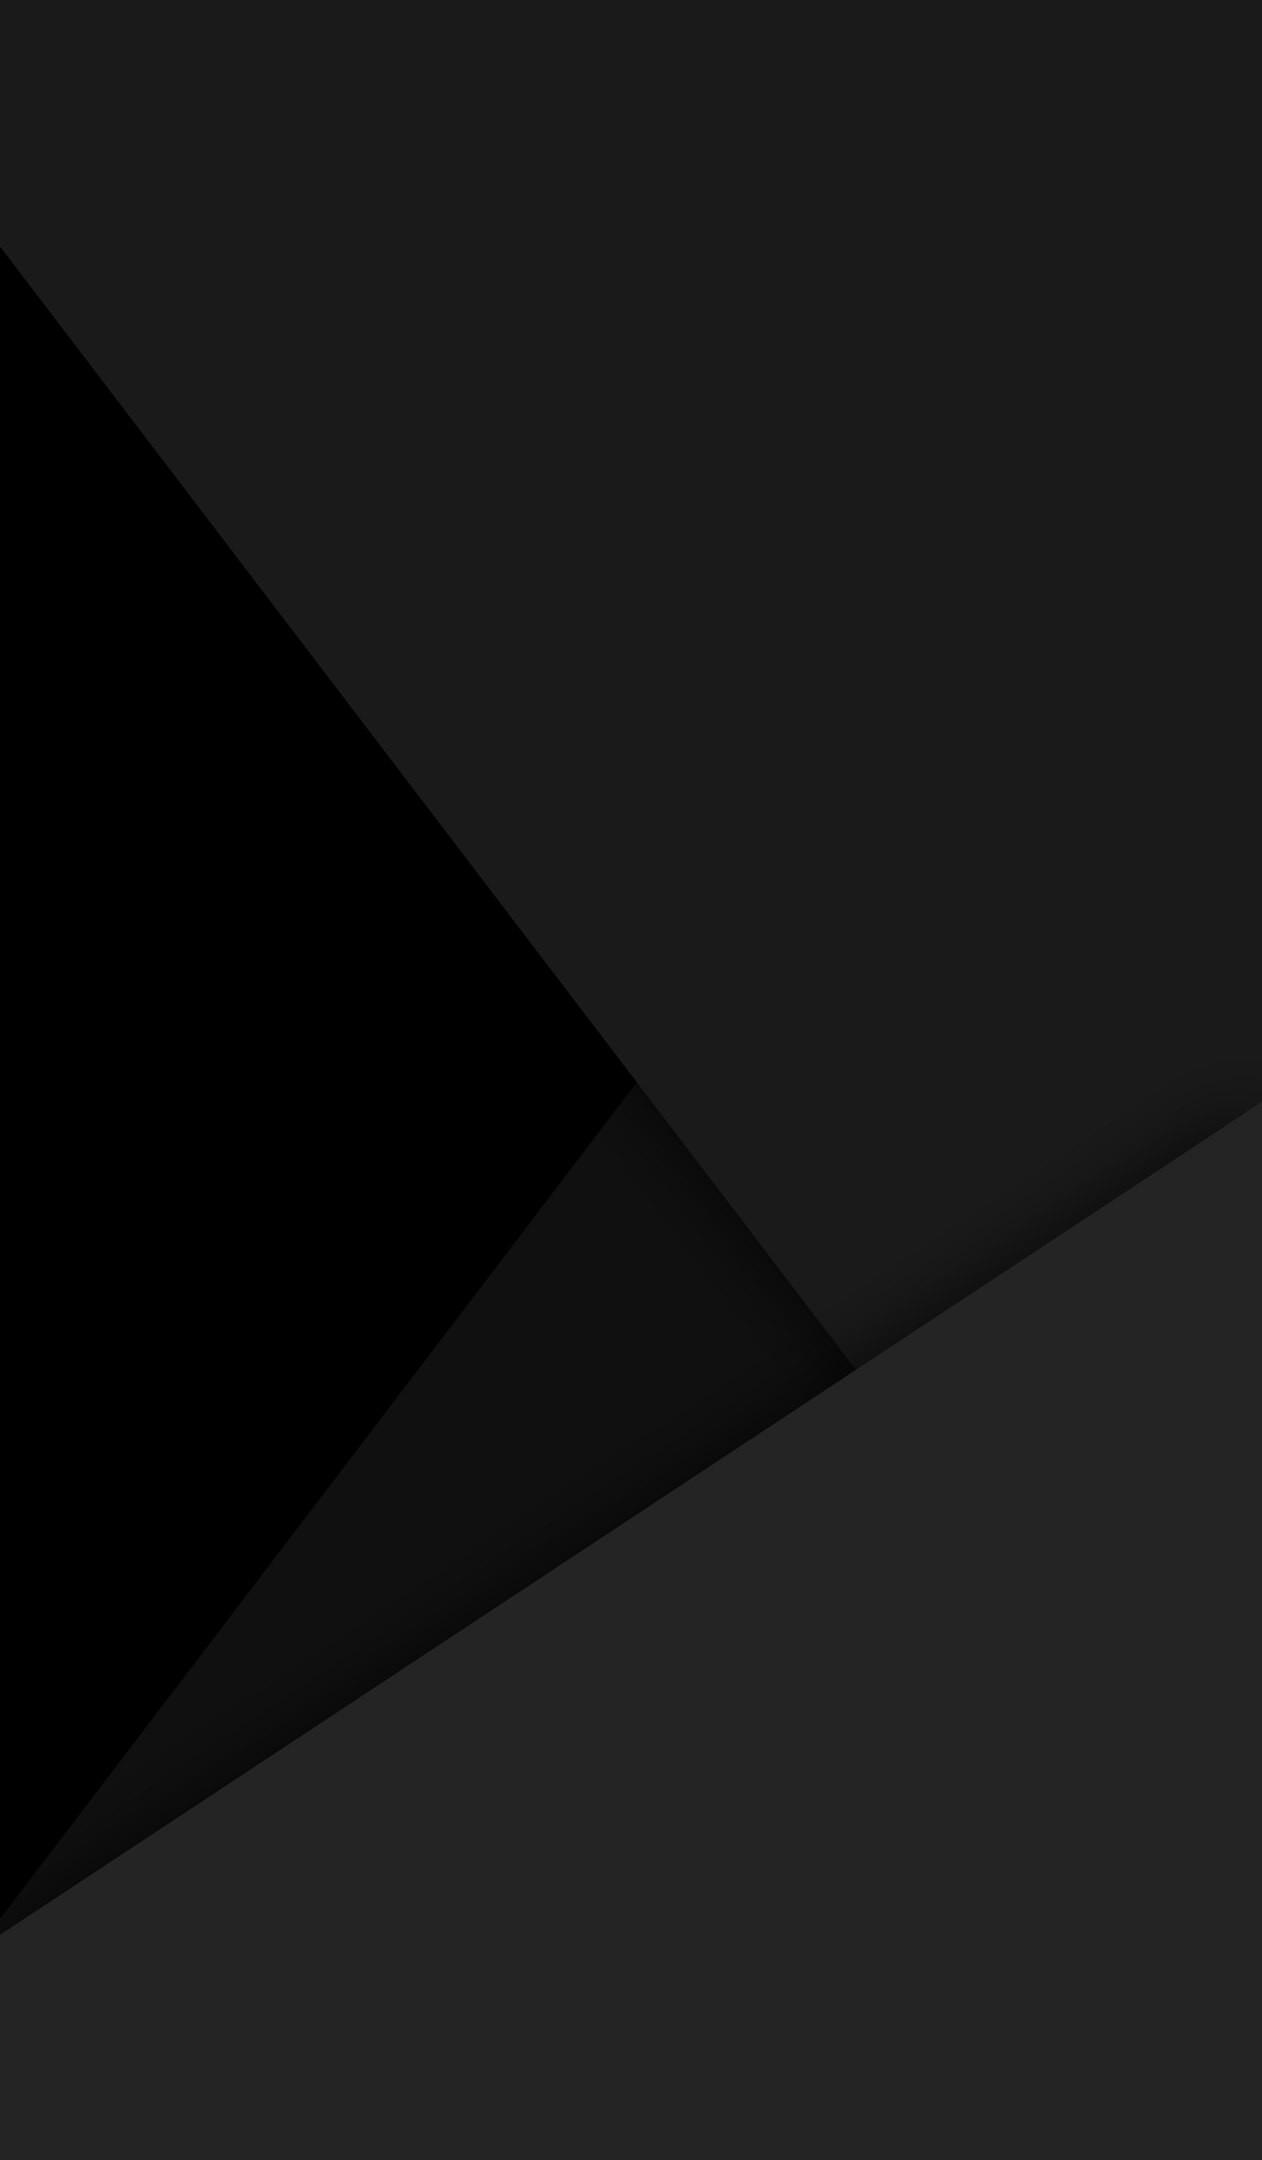 Black amoled Material design wallpaper